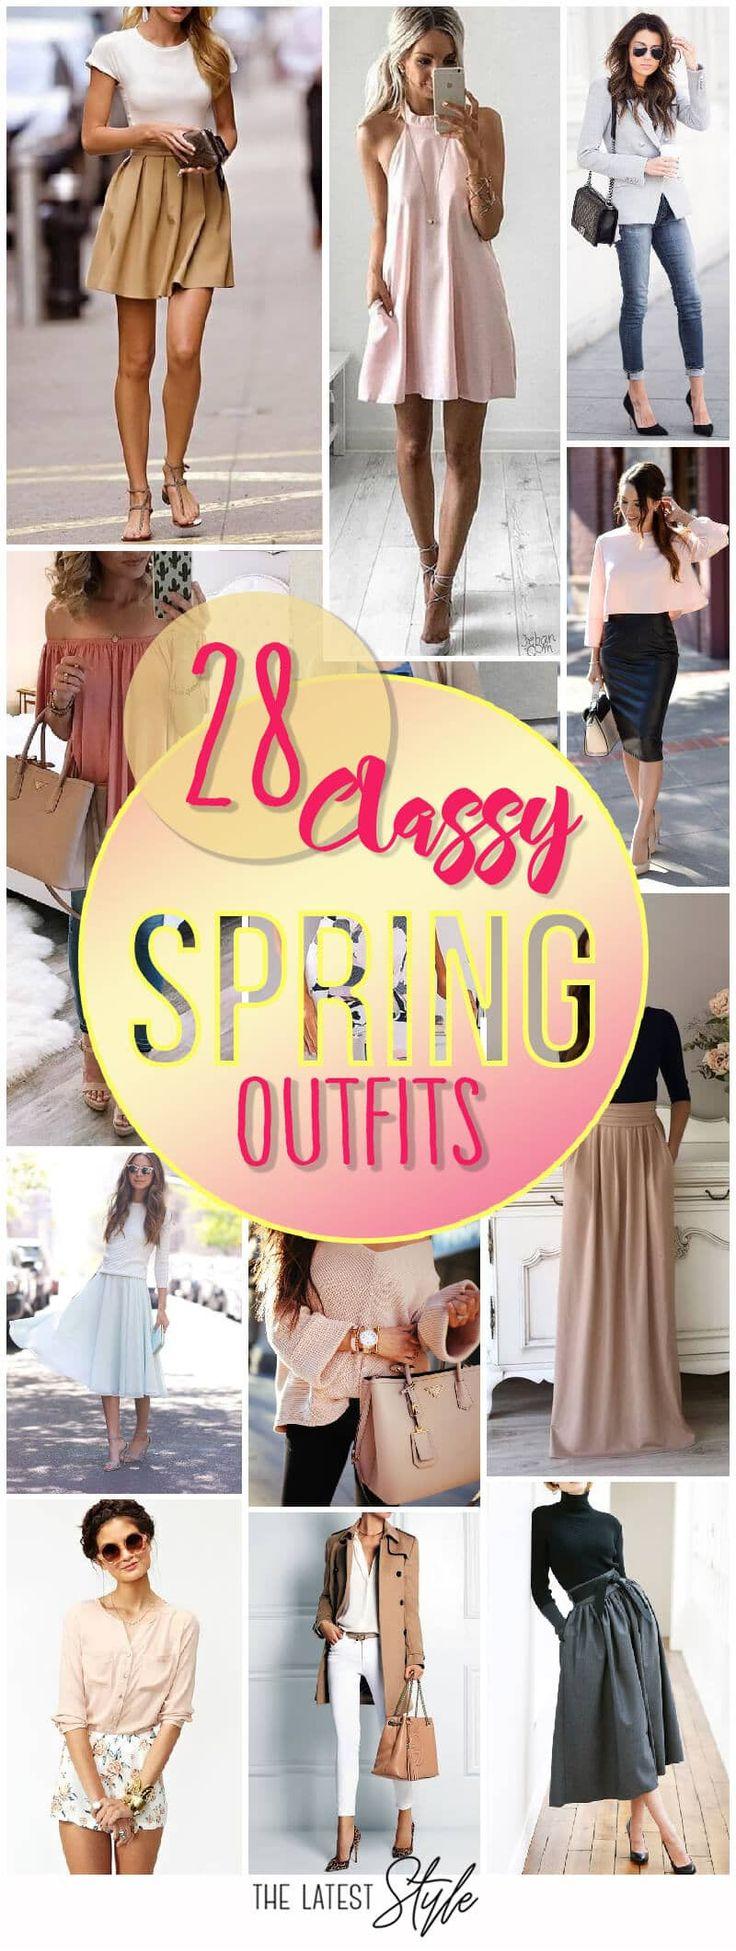 28 Edel Frühling Outfits